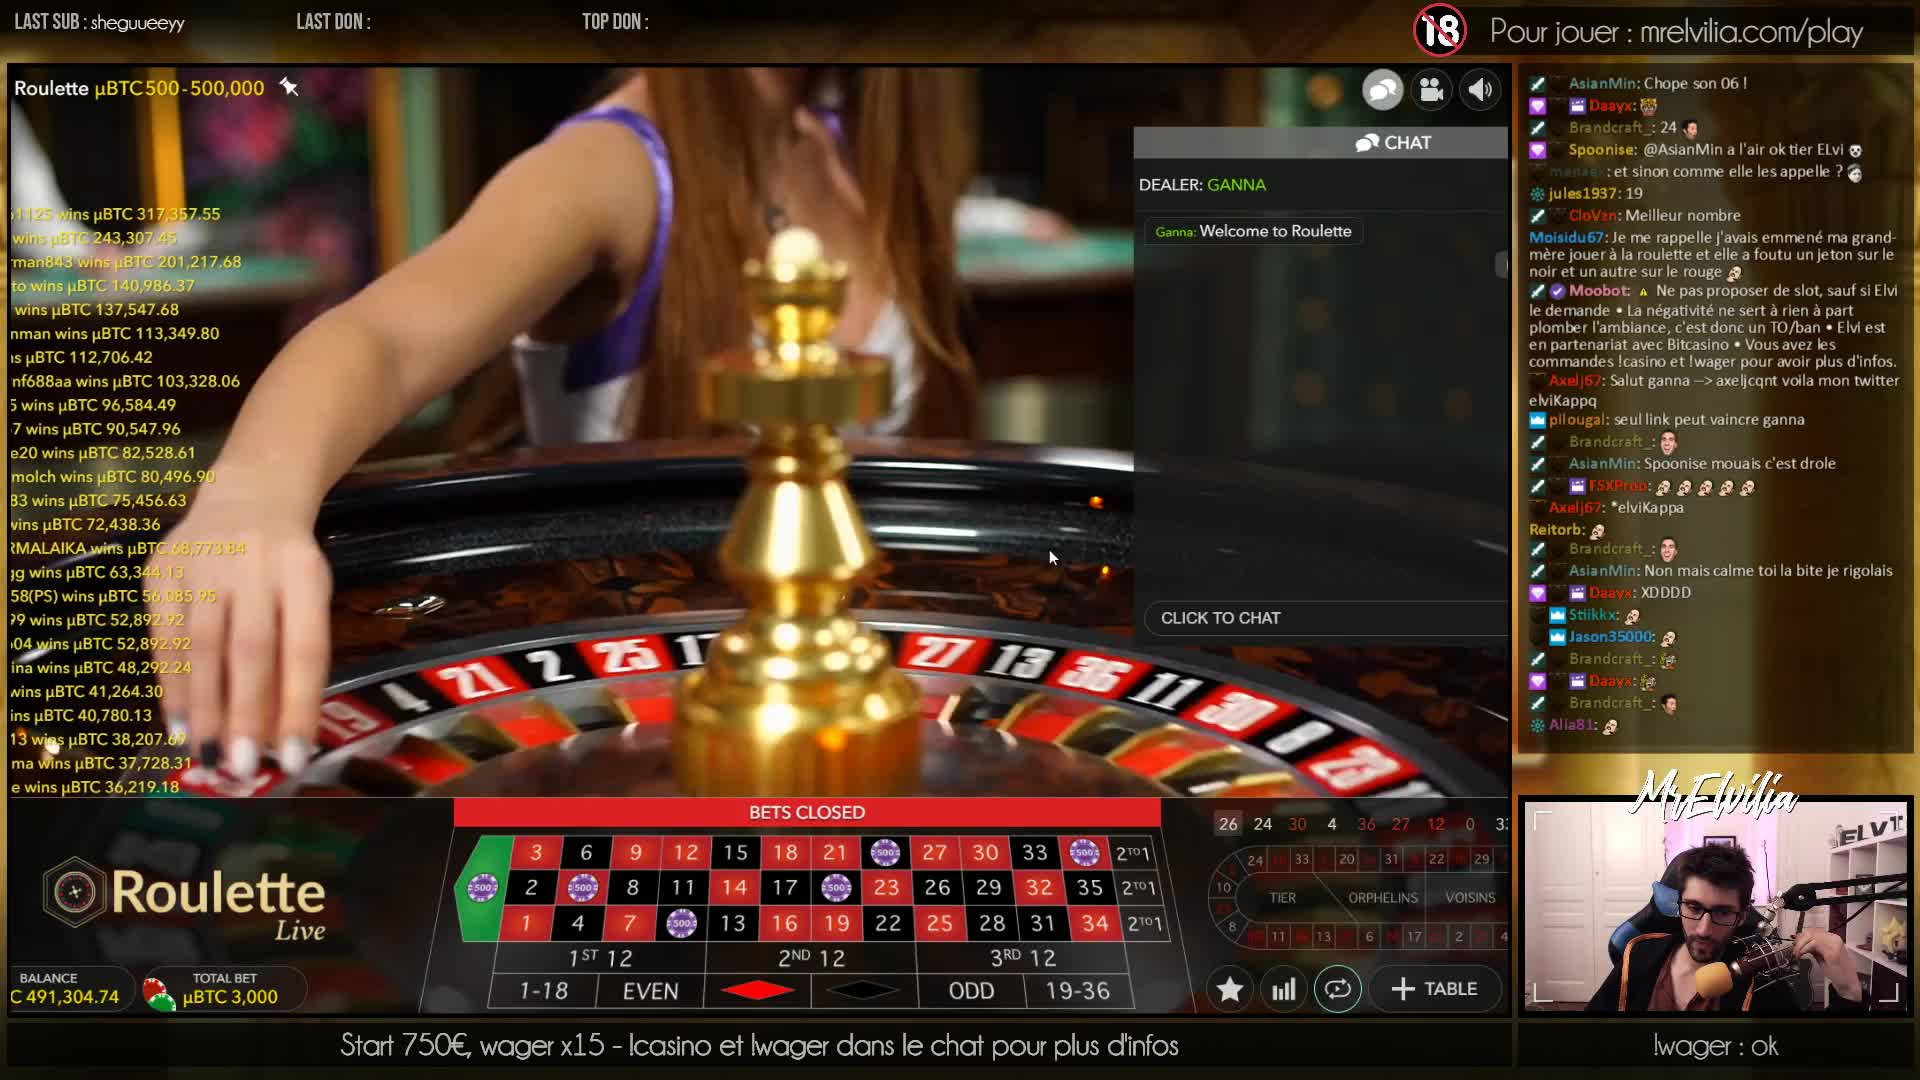 Poker face слушать онлайн